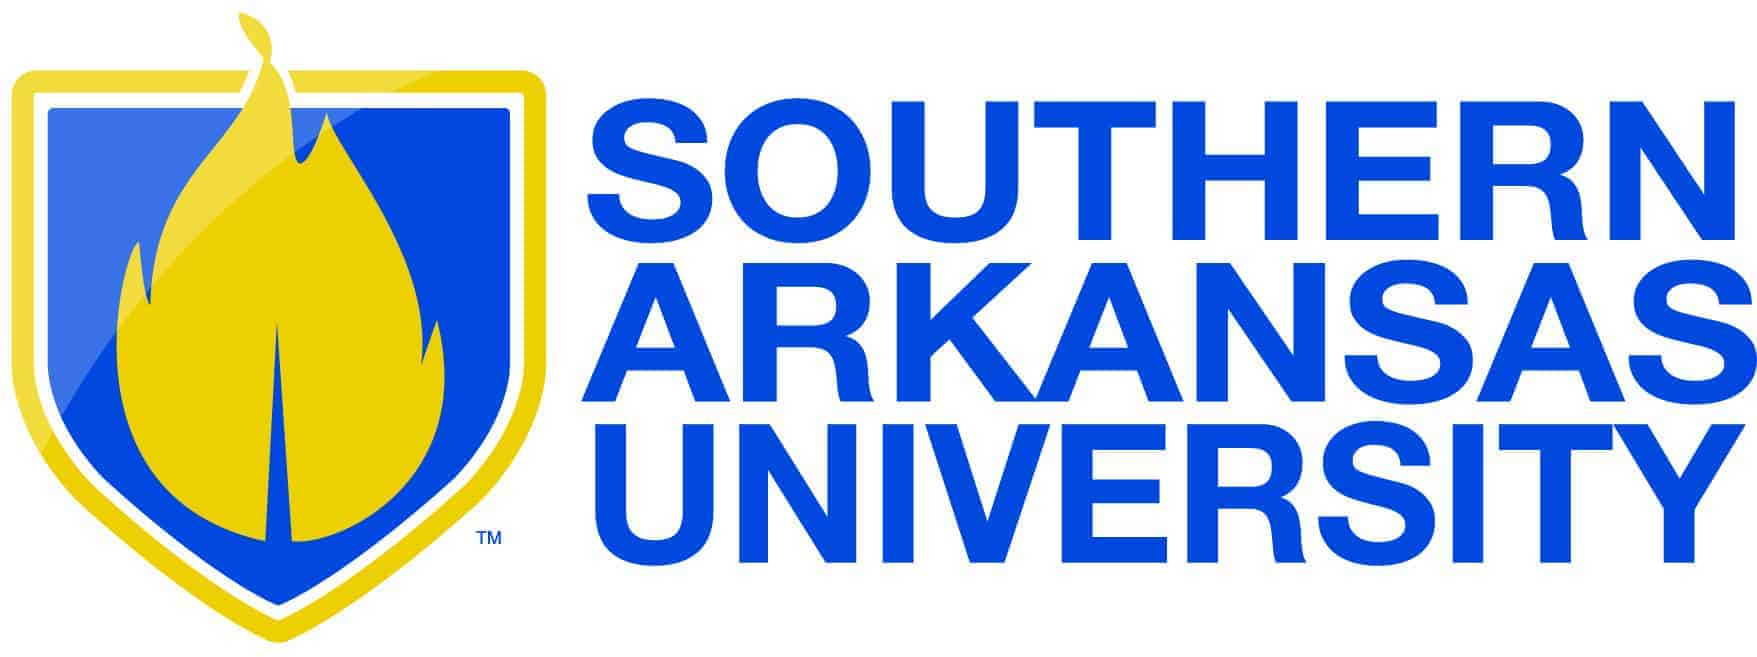 southern arkansas university magnolia logo 8697